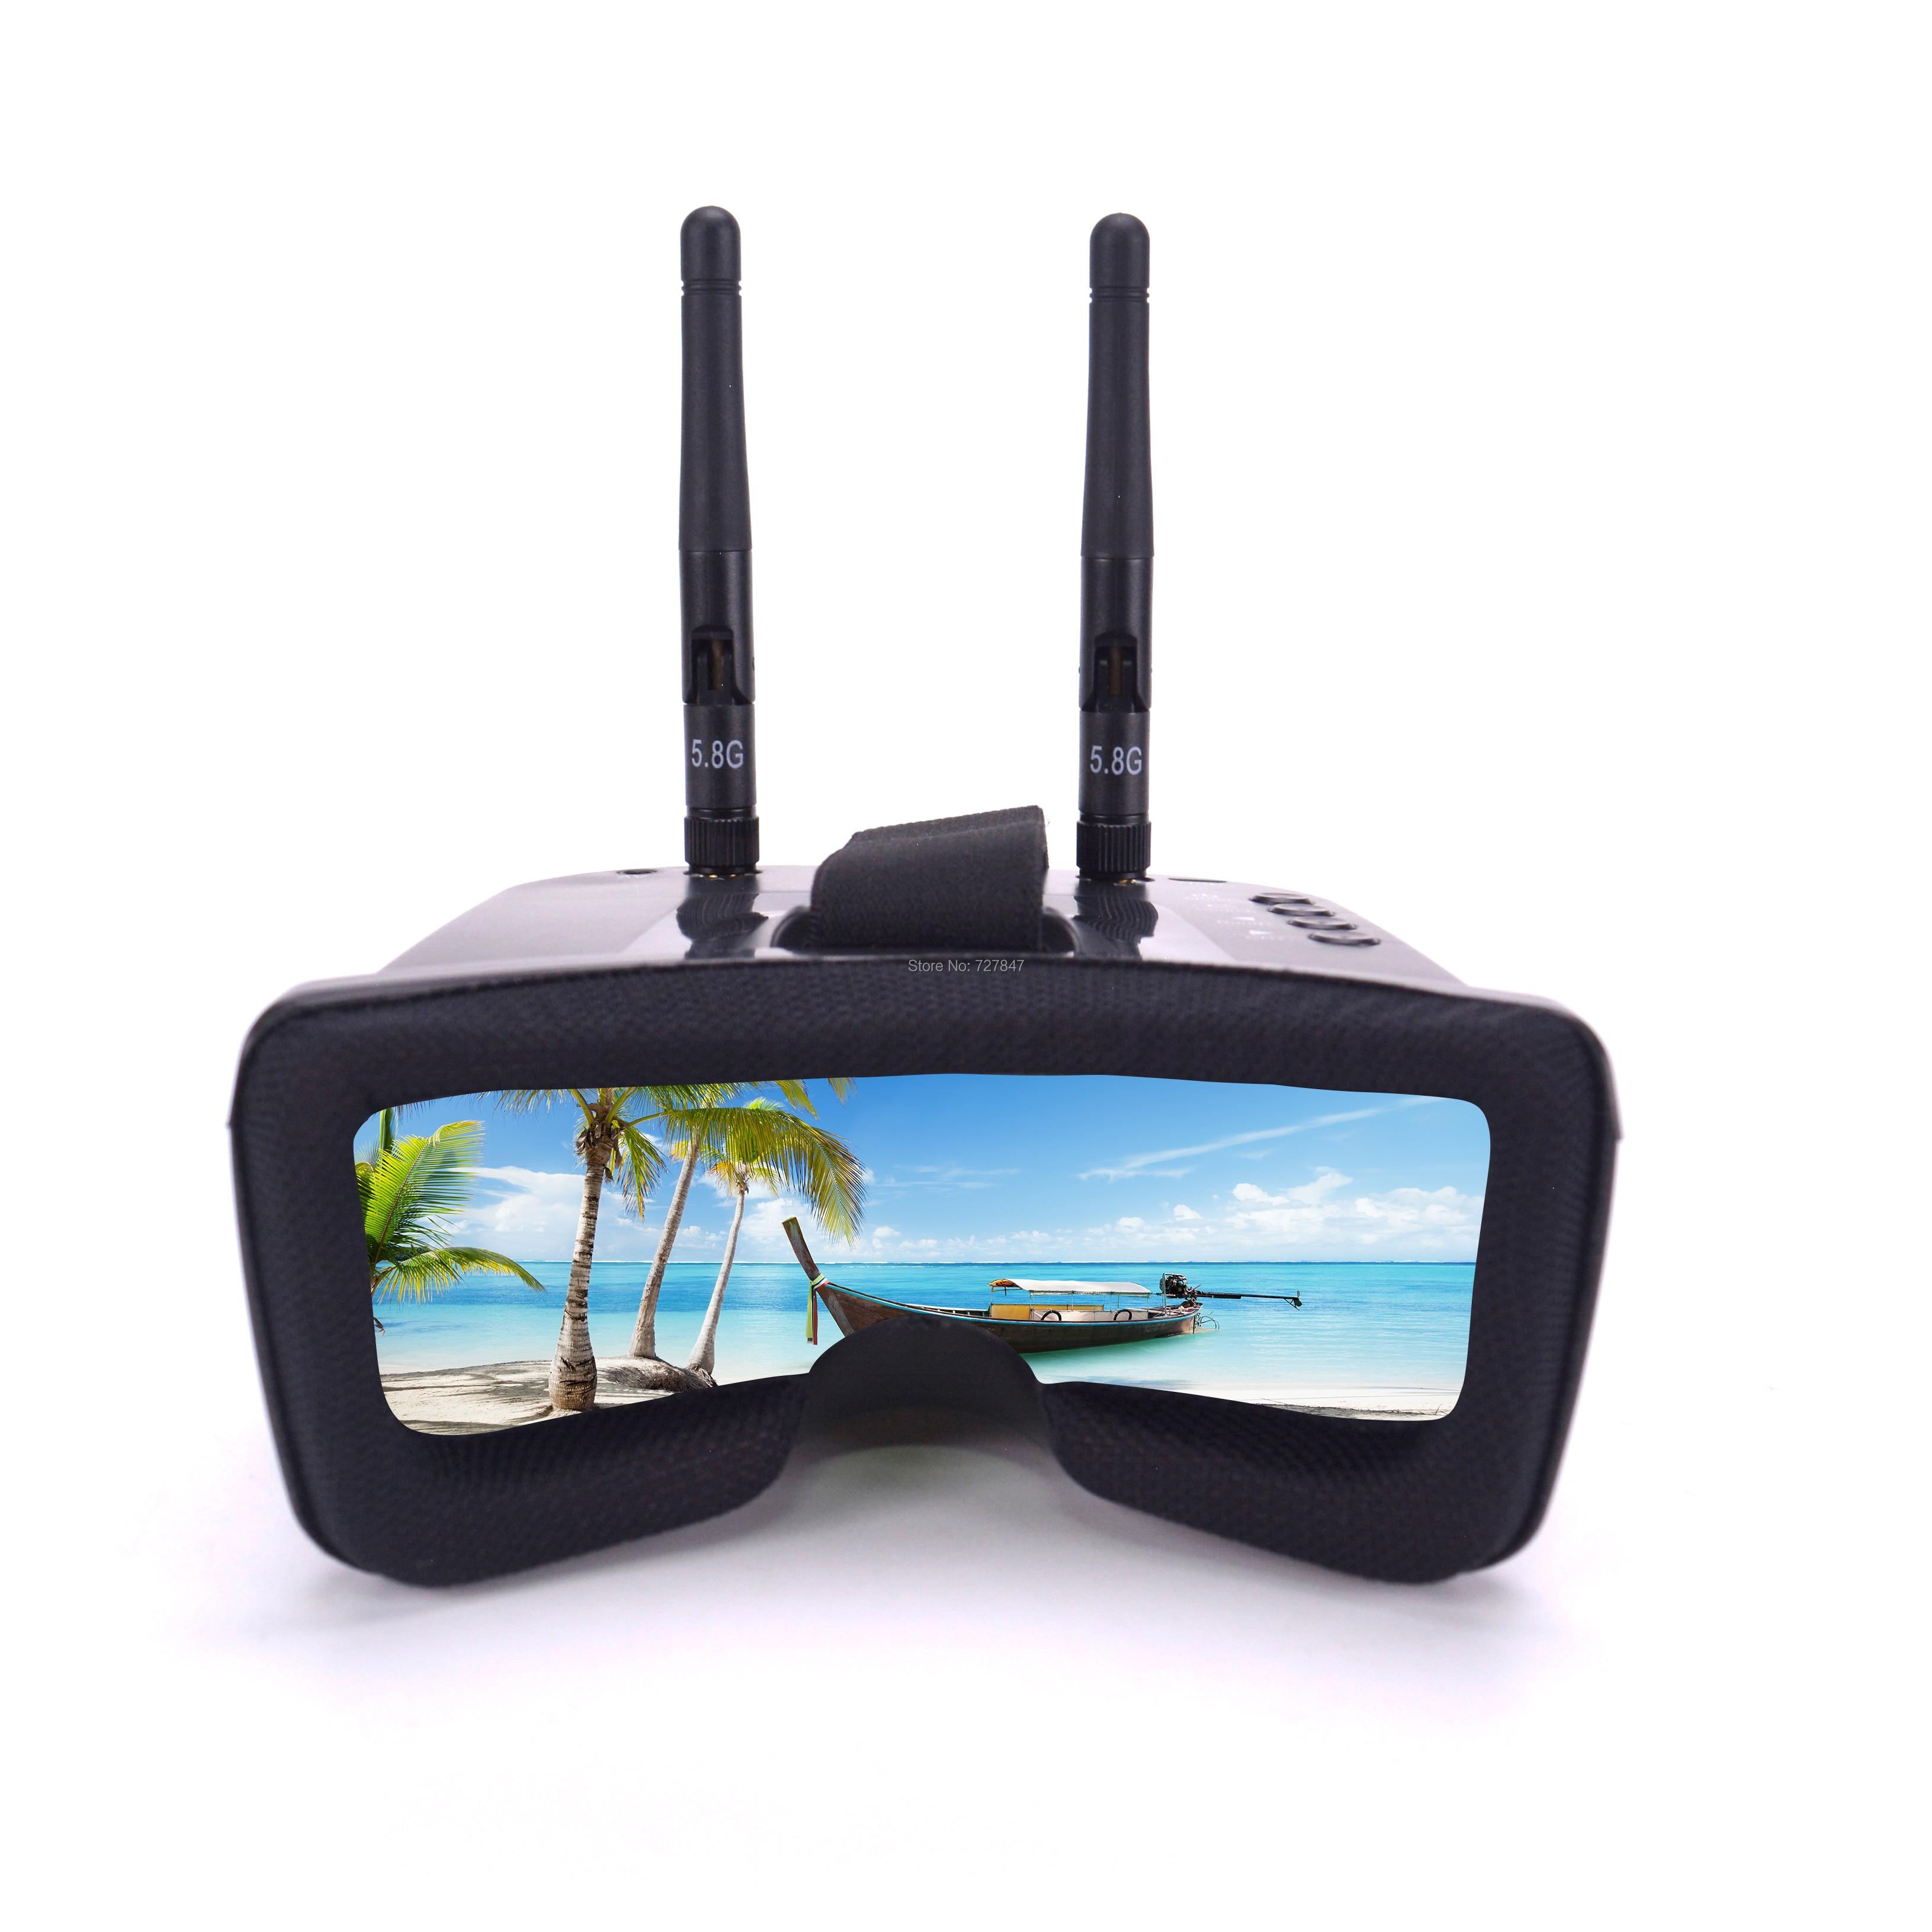 Мини FPV очки 3 дюйма 480*320 дисплей 5,8G 40CH автоматический поиск с Встроенный 3,7 В 1200 мАч аккумулятор для квадрокоптера дрона